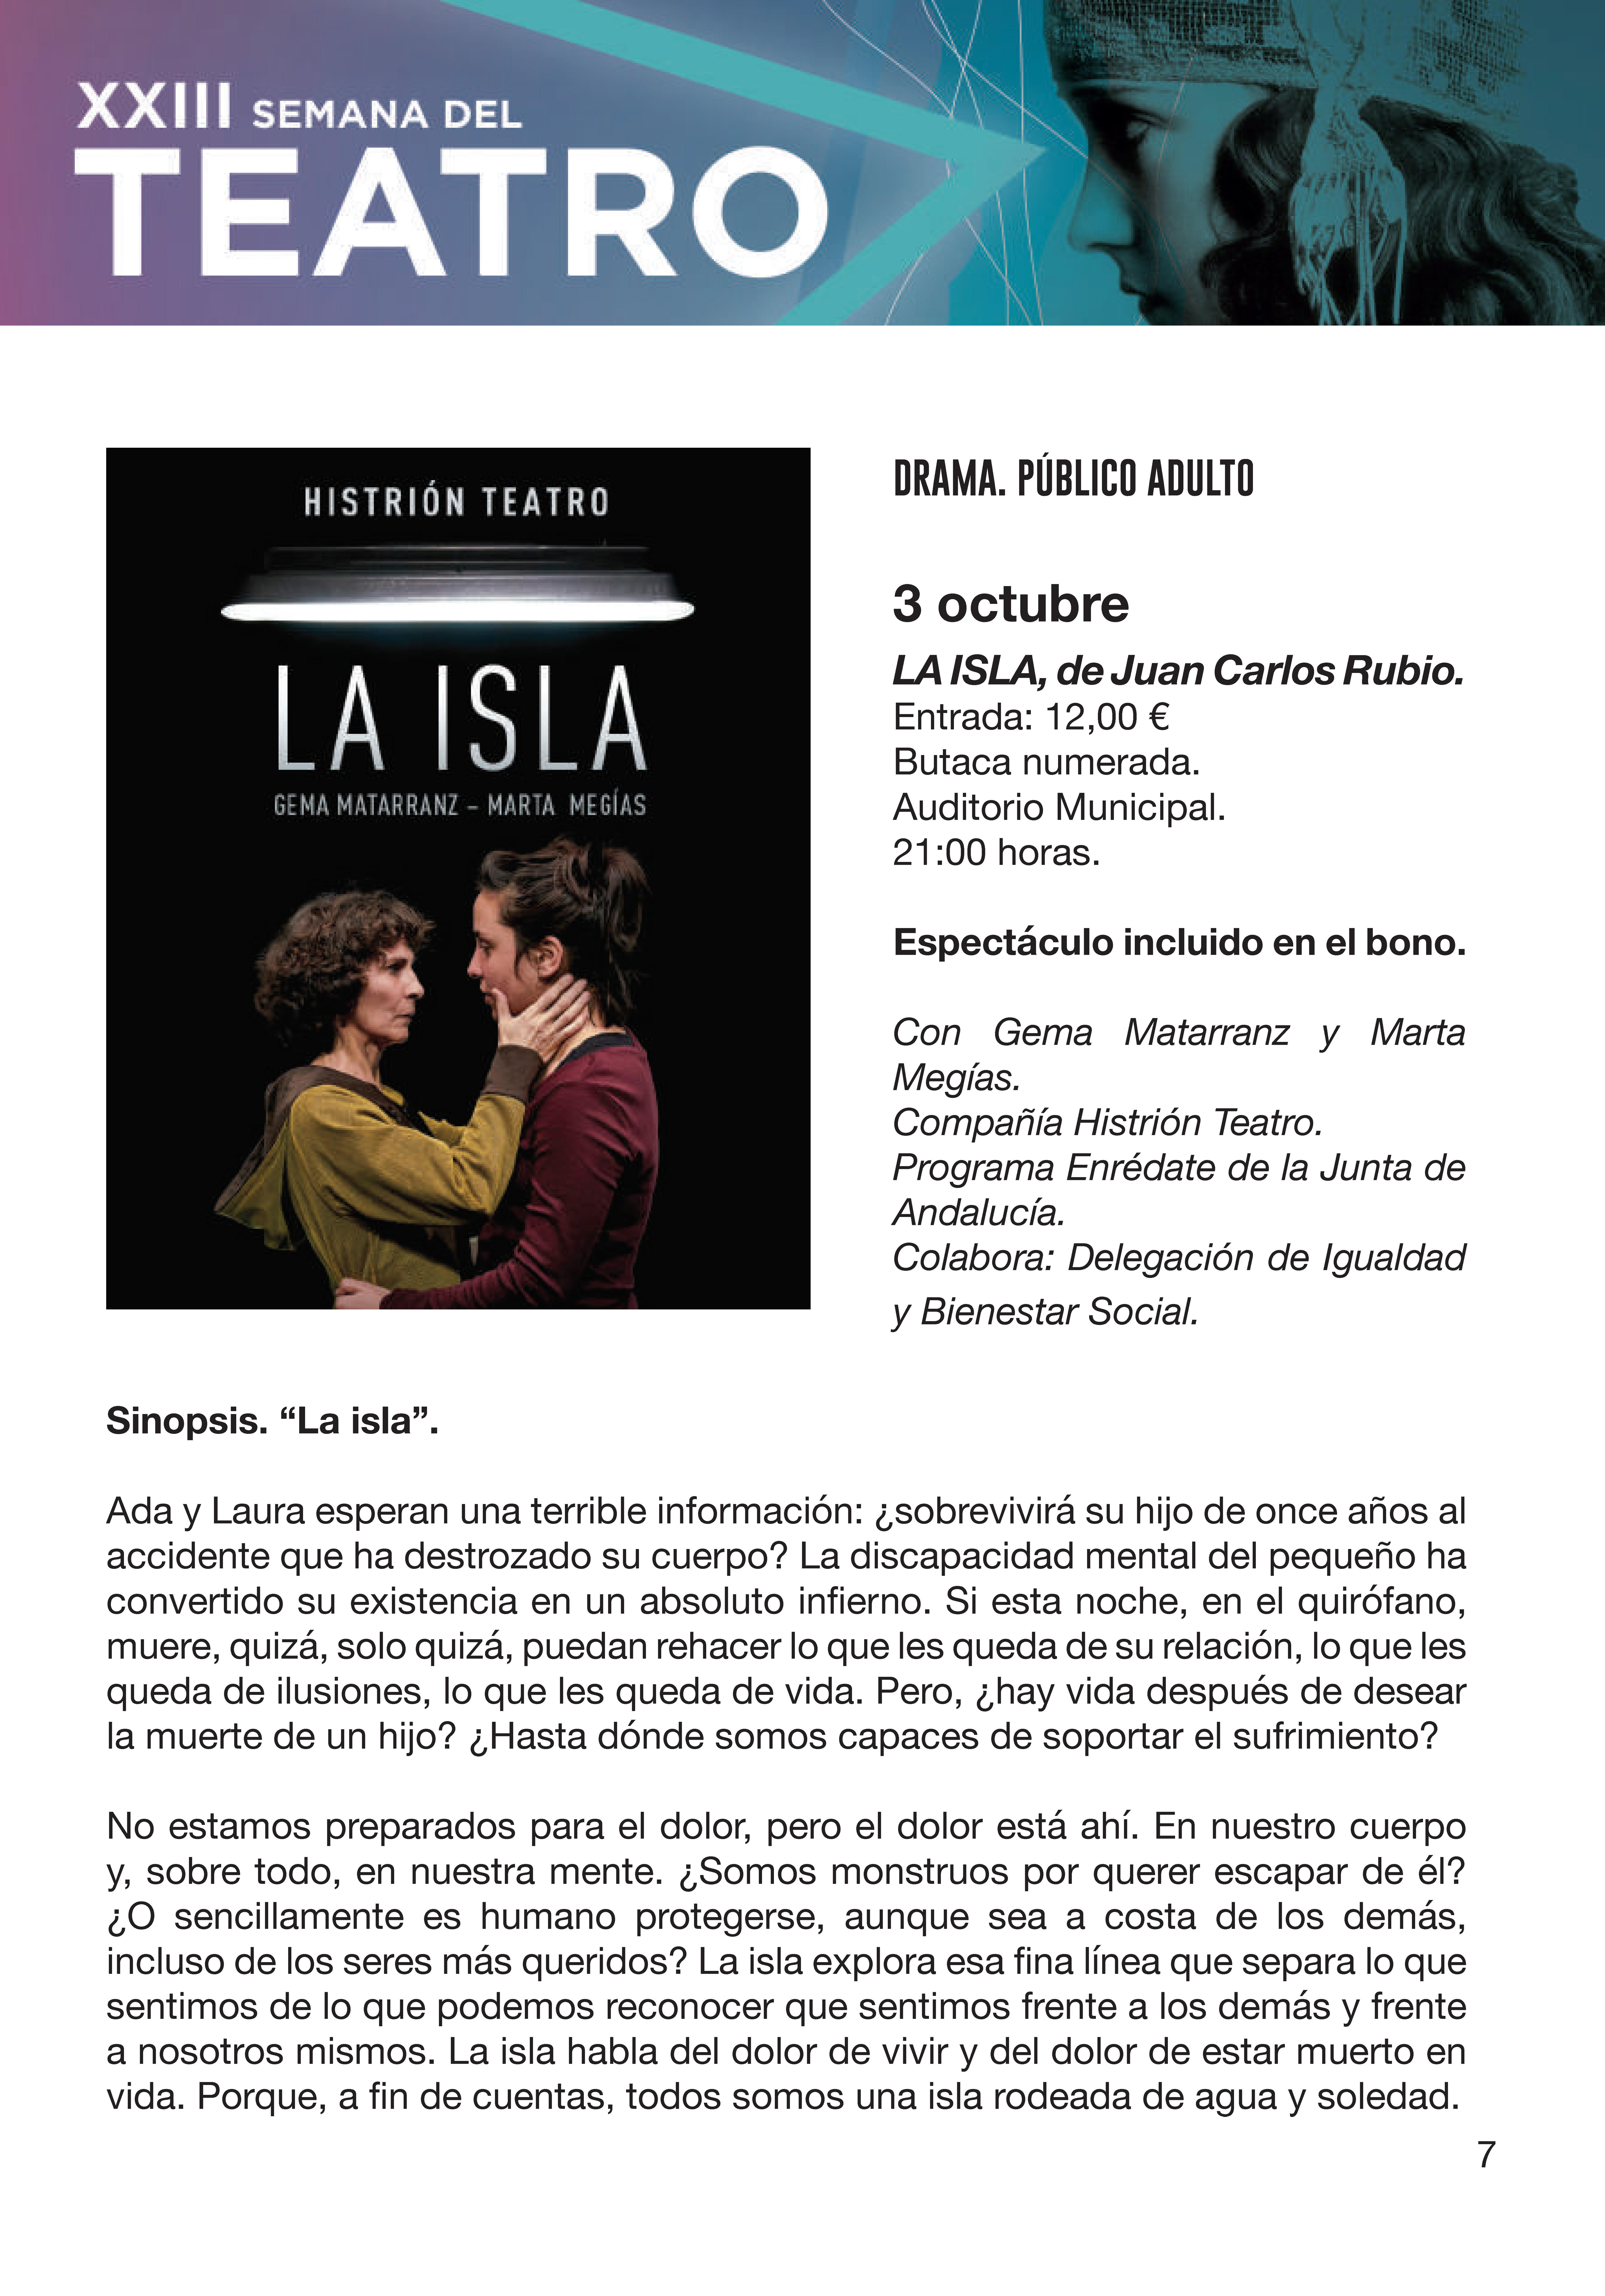 LA ISLA, de Juan Carlos Rubio. @ Auditorio Municipal